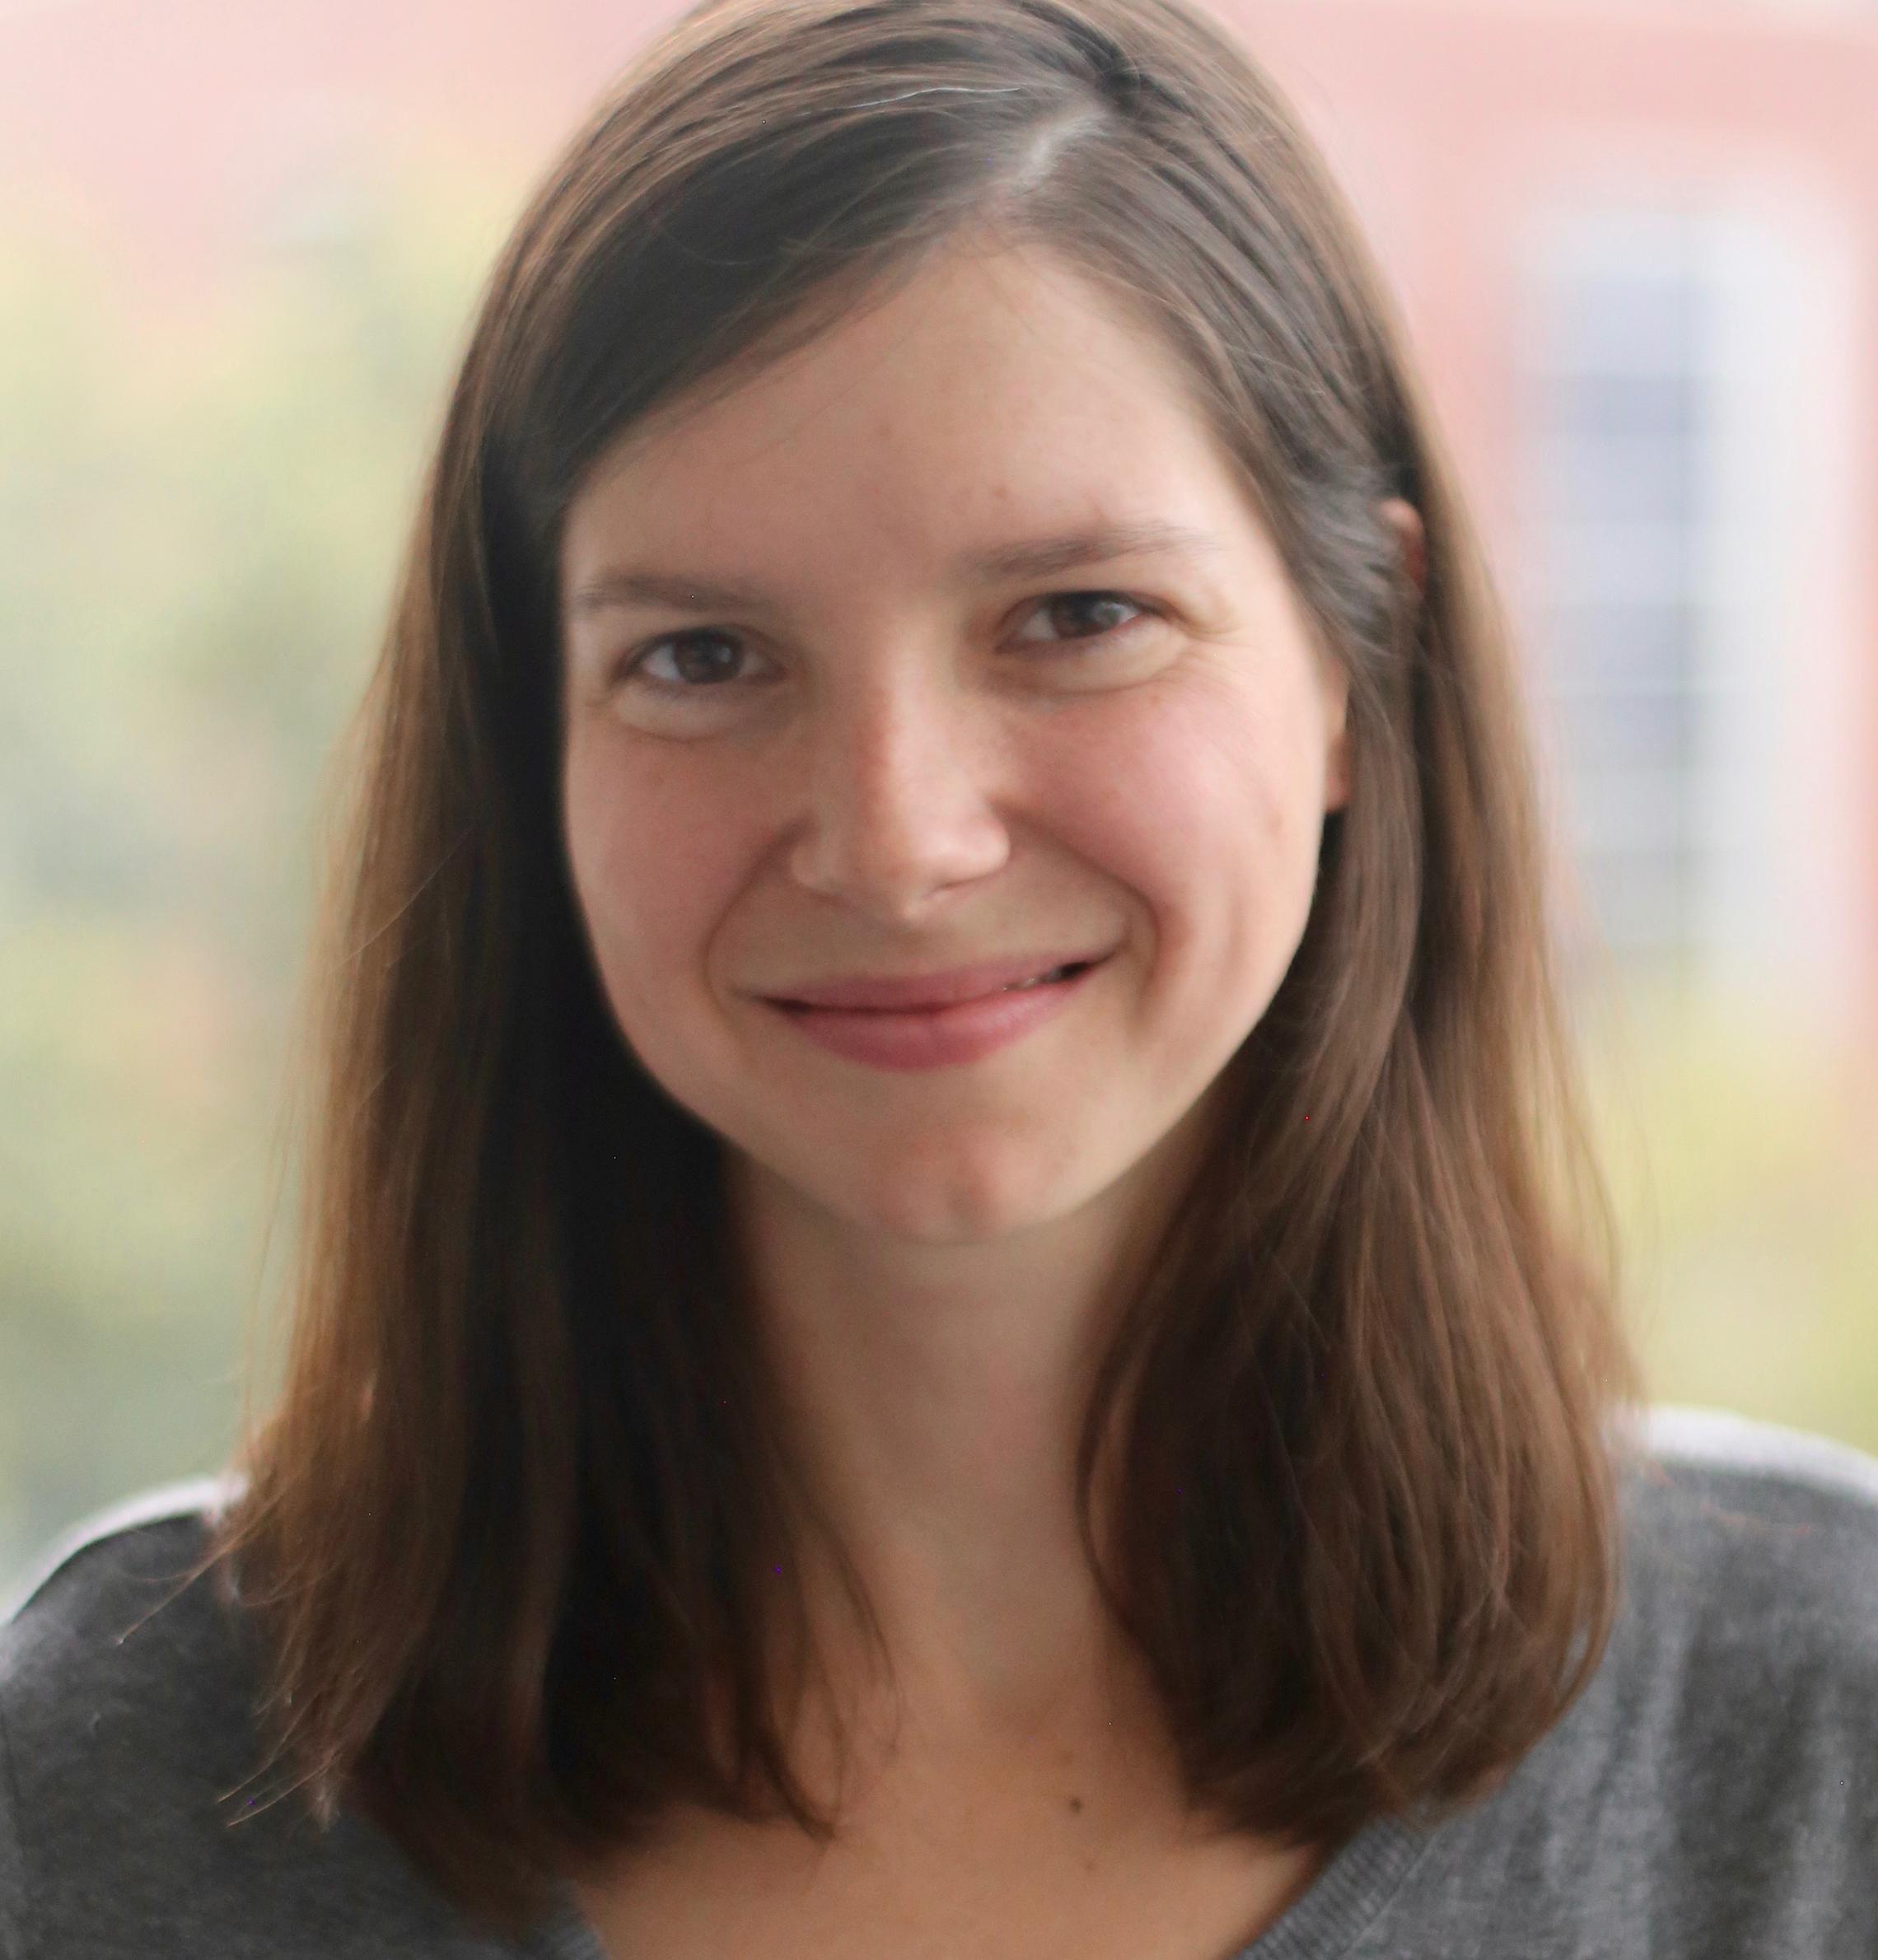 Chelsea Herdman, PhD - Postdoctoral Fellow - H. Joseph Yost Lab